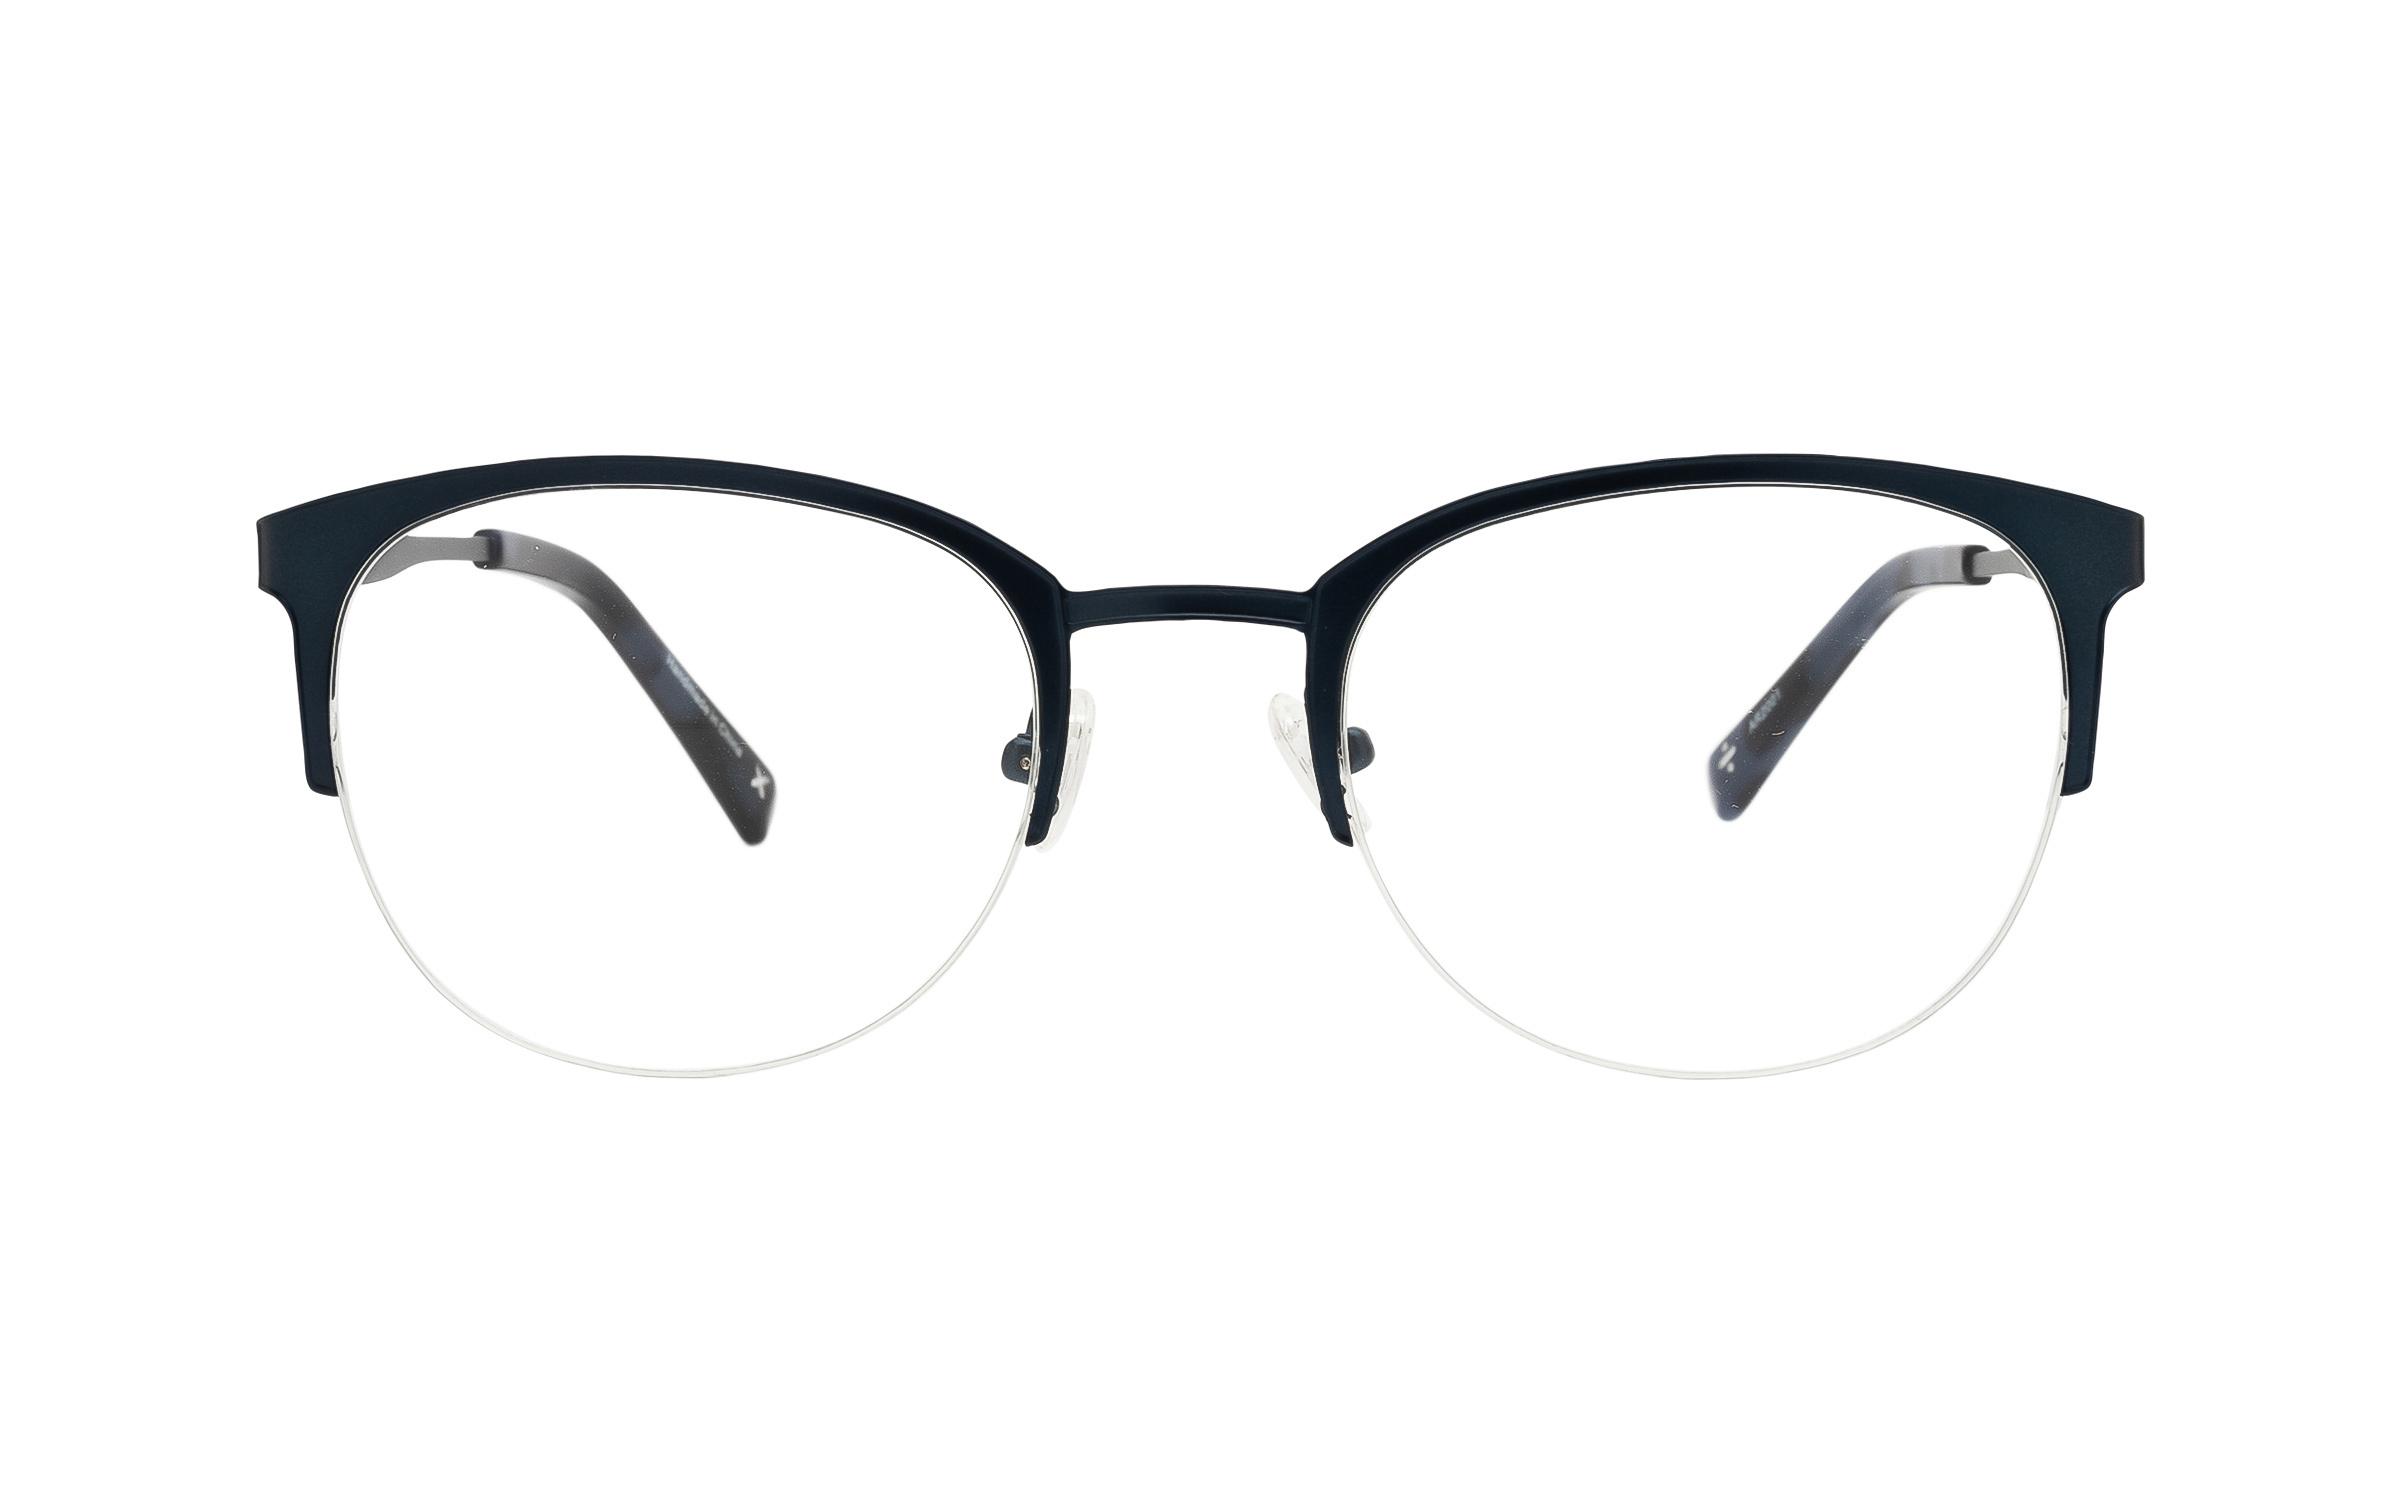 http://www.coastal.com/ - Derek Cardigan Helike TIT010 C02 (51) Eyeglasses and Frame in Navy Blue | Plastic – Online Coastal